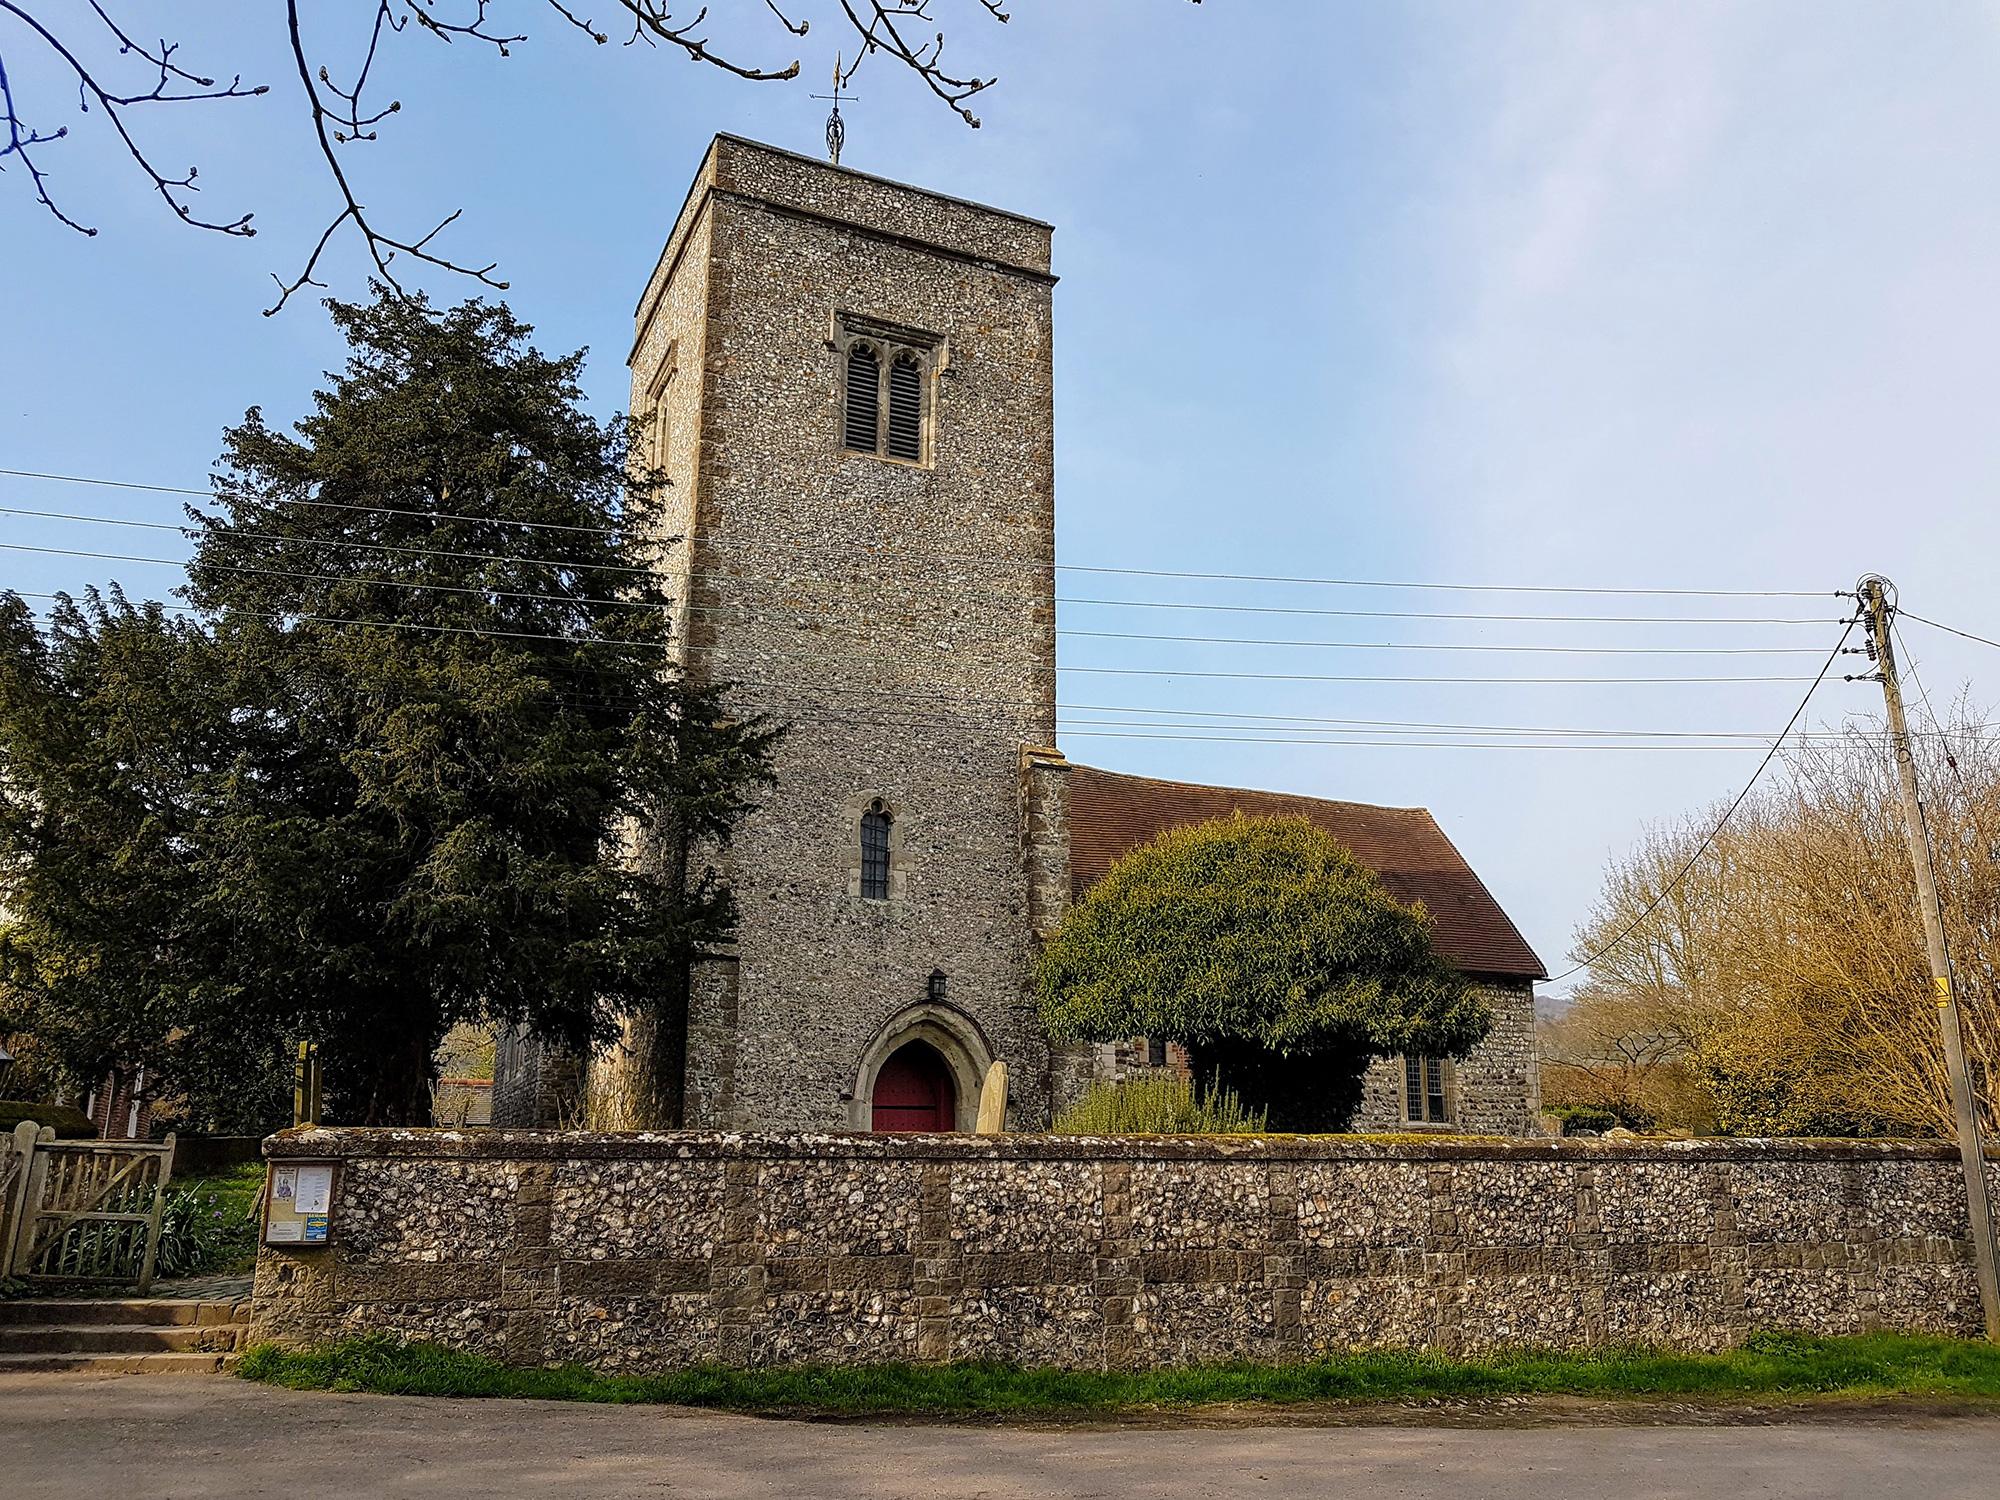 St Peter & St Paul Church, Trottiscliffe